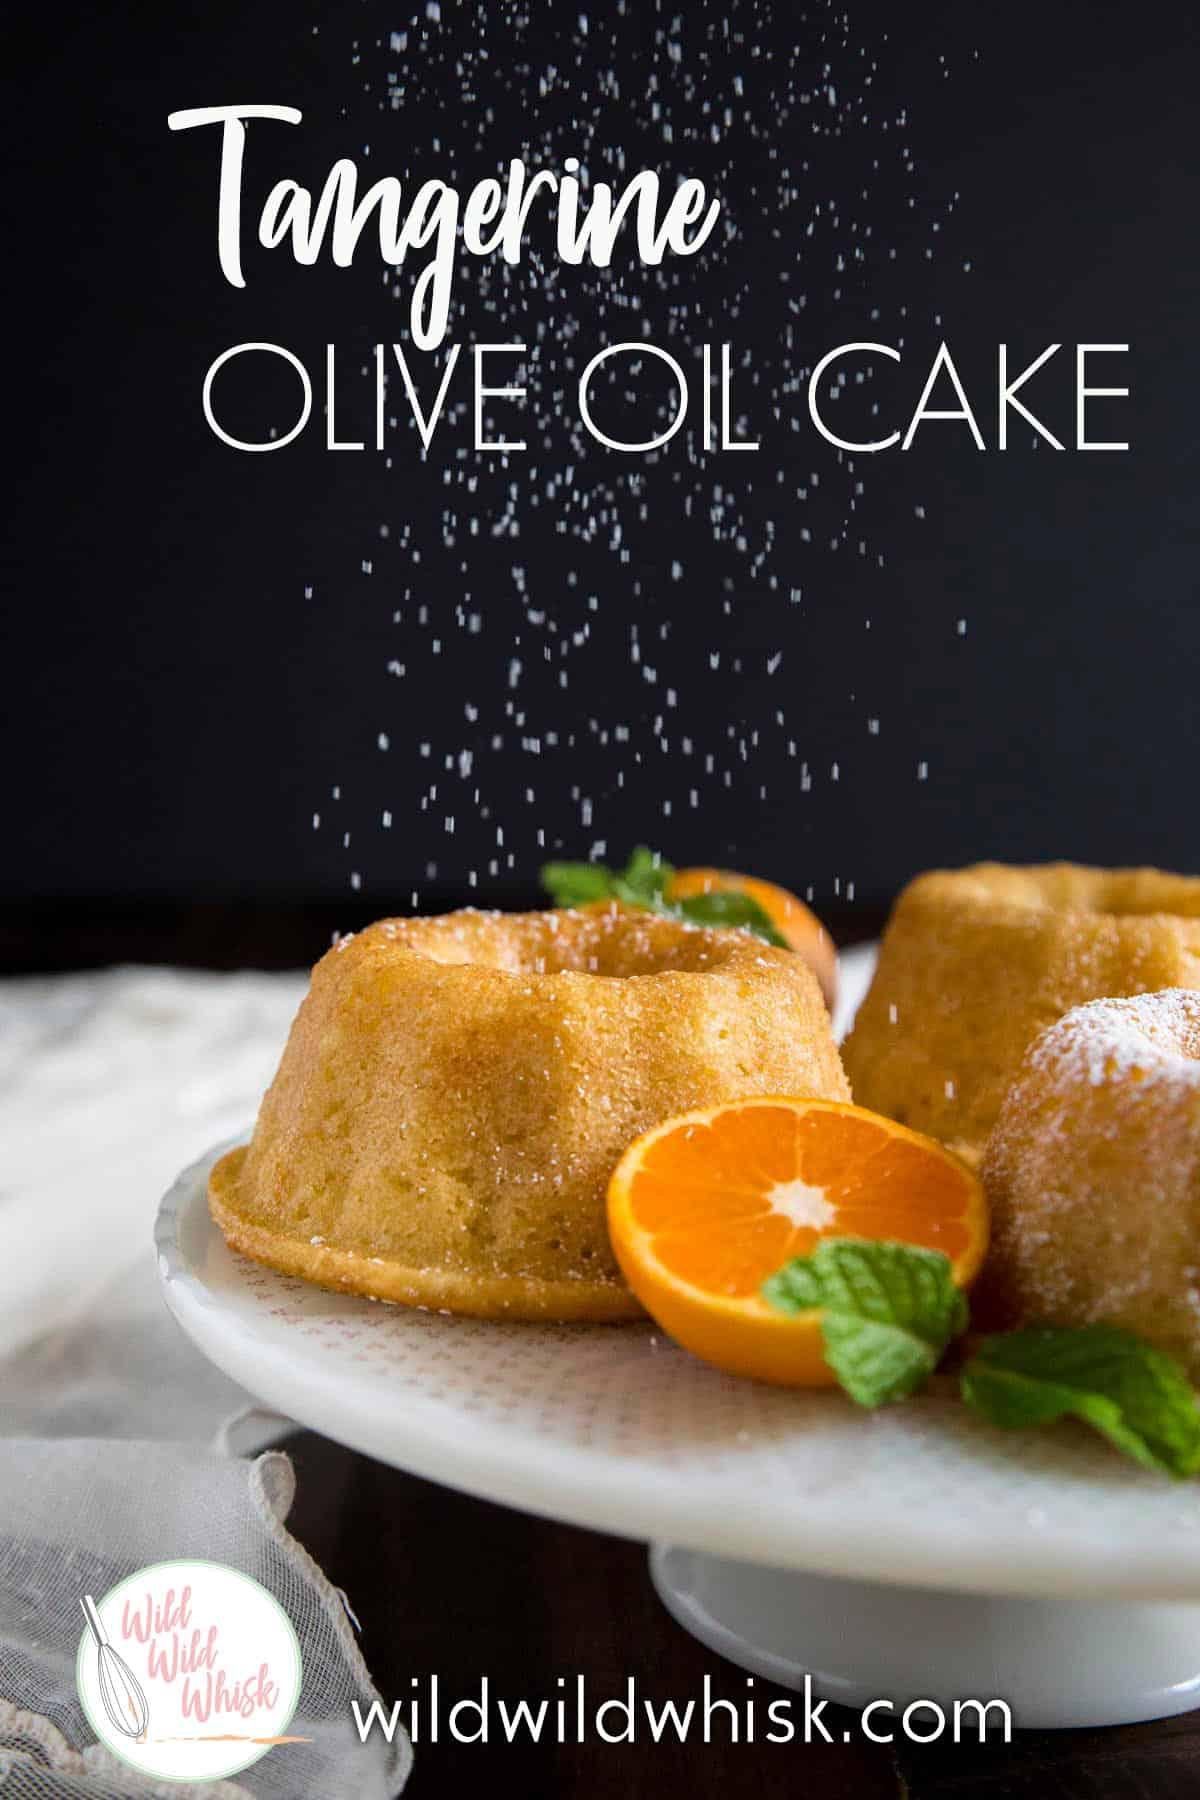 Tangerine Olive Oil Cake is baked in mini bundt pans to yield soft, moist an refreshing tangerine bundt cakes. #wildwildwhisk #oliveoilcake #bundtcake #cake #tangerine #cakerecipe #tangerinecake #citruscake #simpletangerinecake #easybundtcake #bundtcakerecipes #minibundtcakes